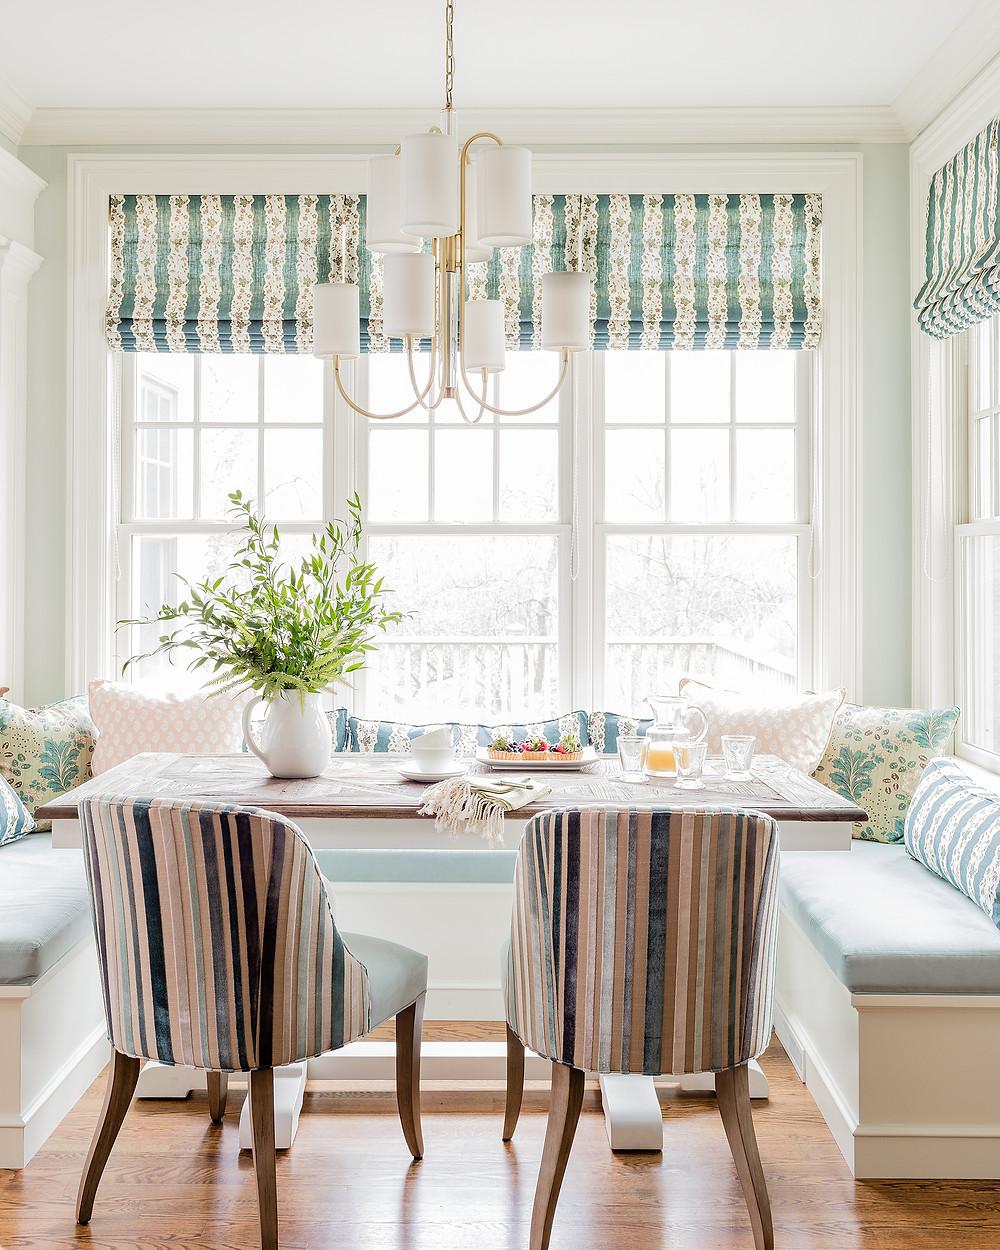 Robin Gannon Interiors, Farmhouse Dining, Built Ins, Modern Light, Fresh Plants